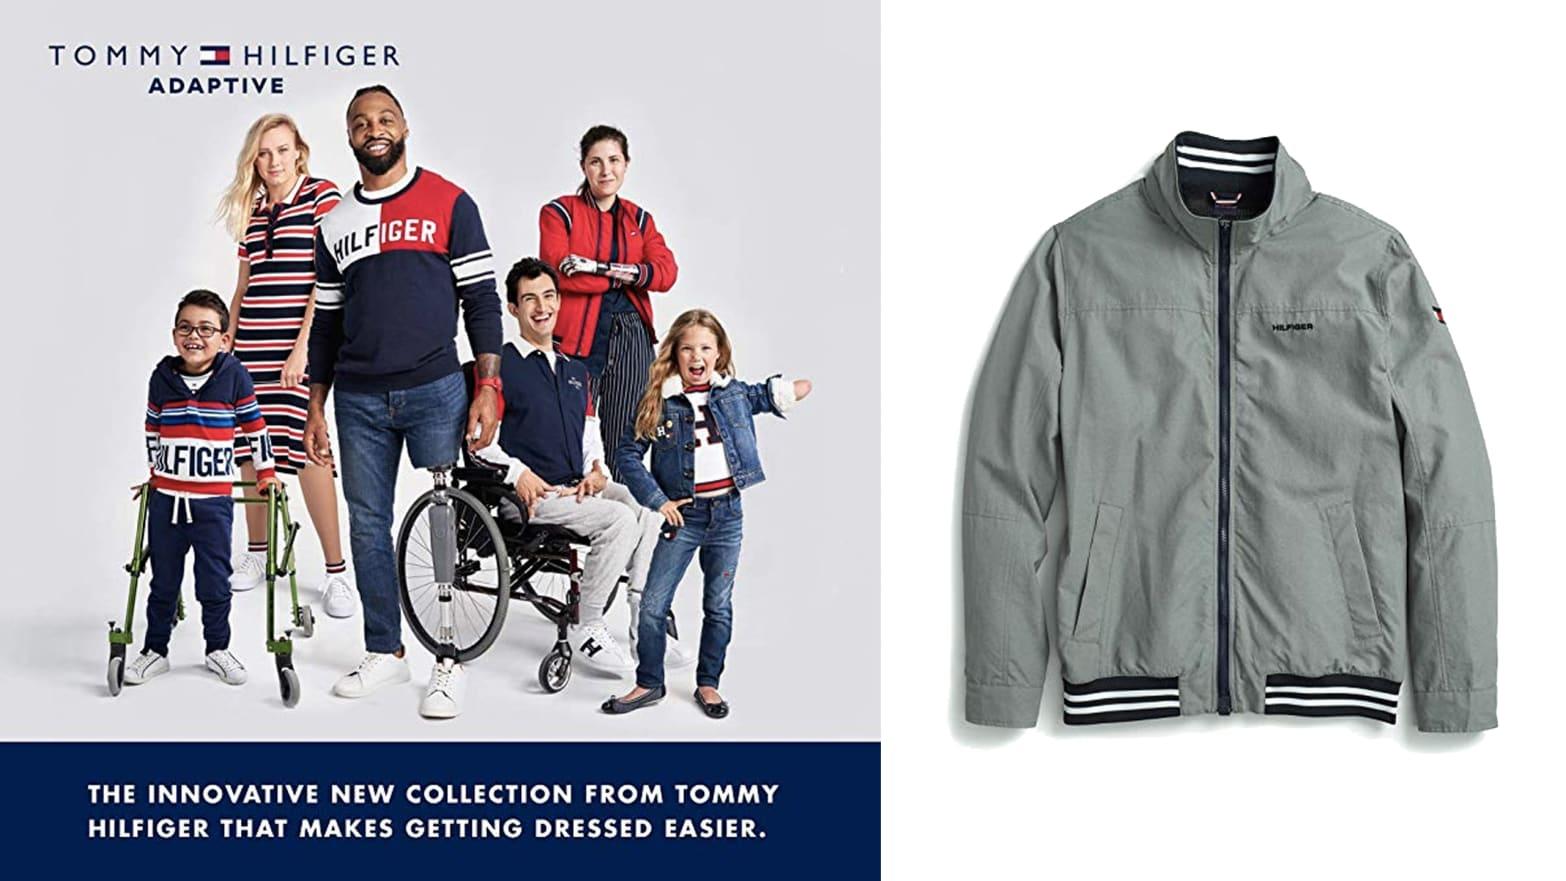 damen spätester Verkauf professionelles Design Shop the Tommy Hilfiger Adaptive Clothing Sale on Amazon